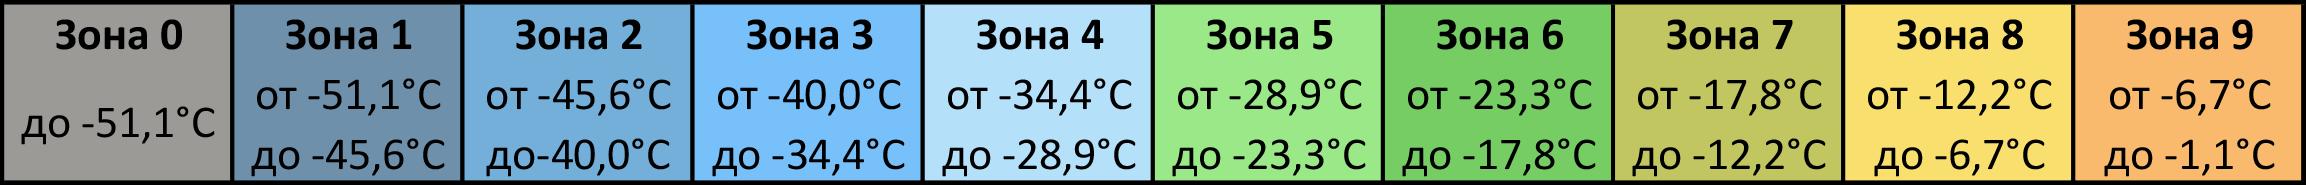 Таблица зон морозостойкости растений территории России